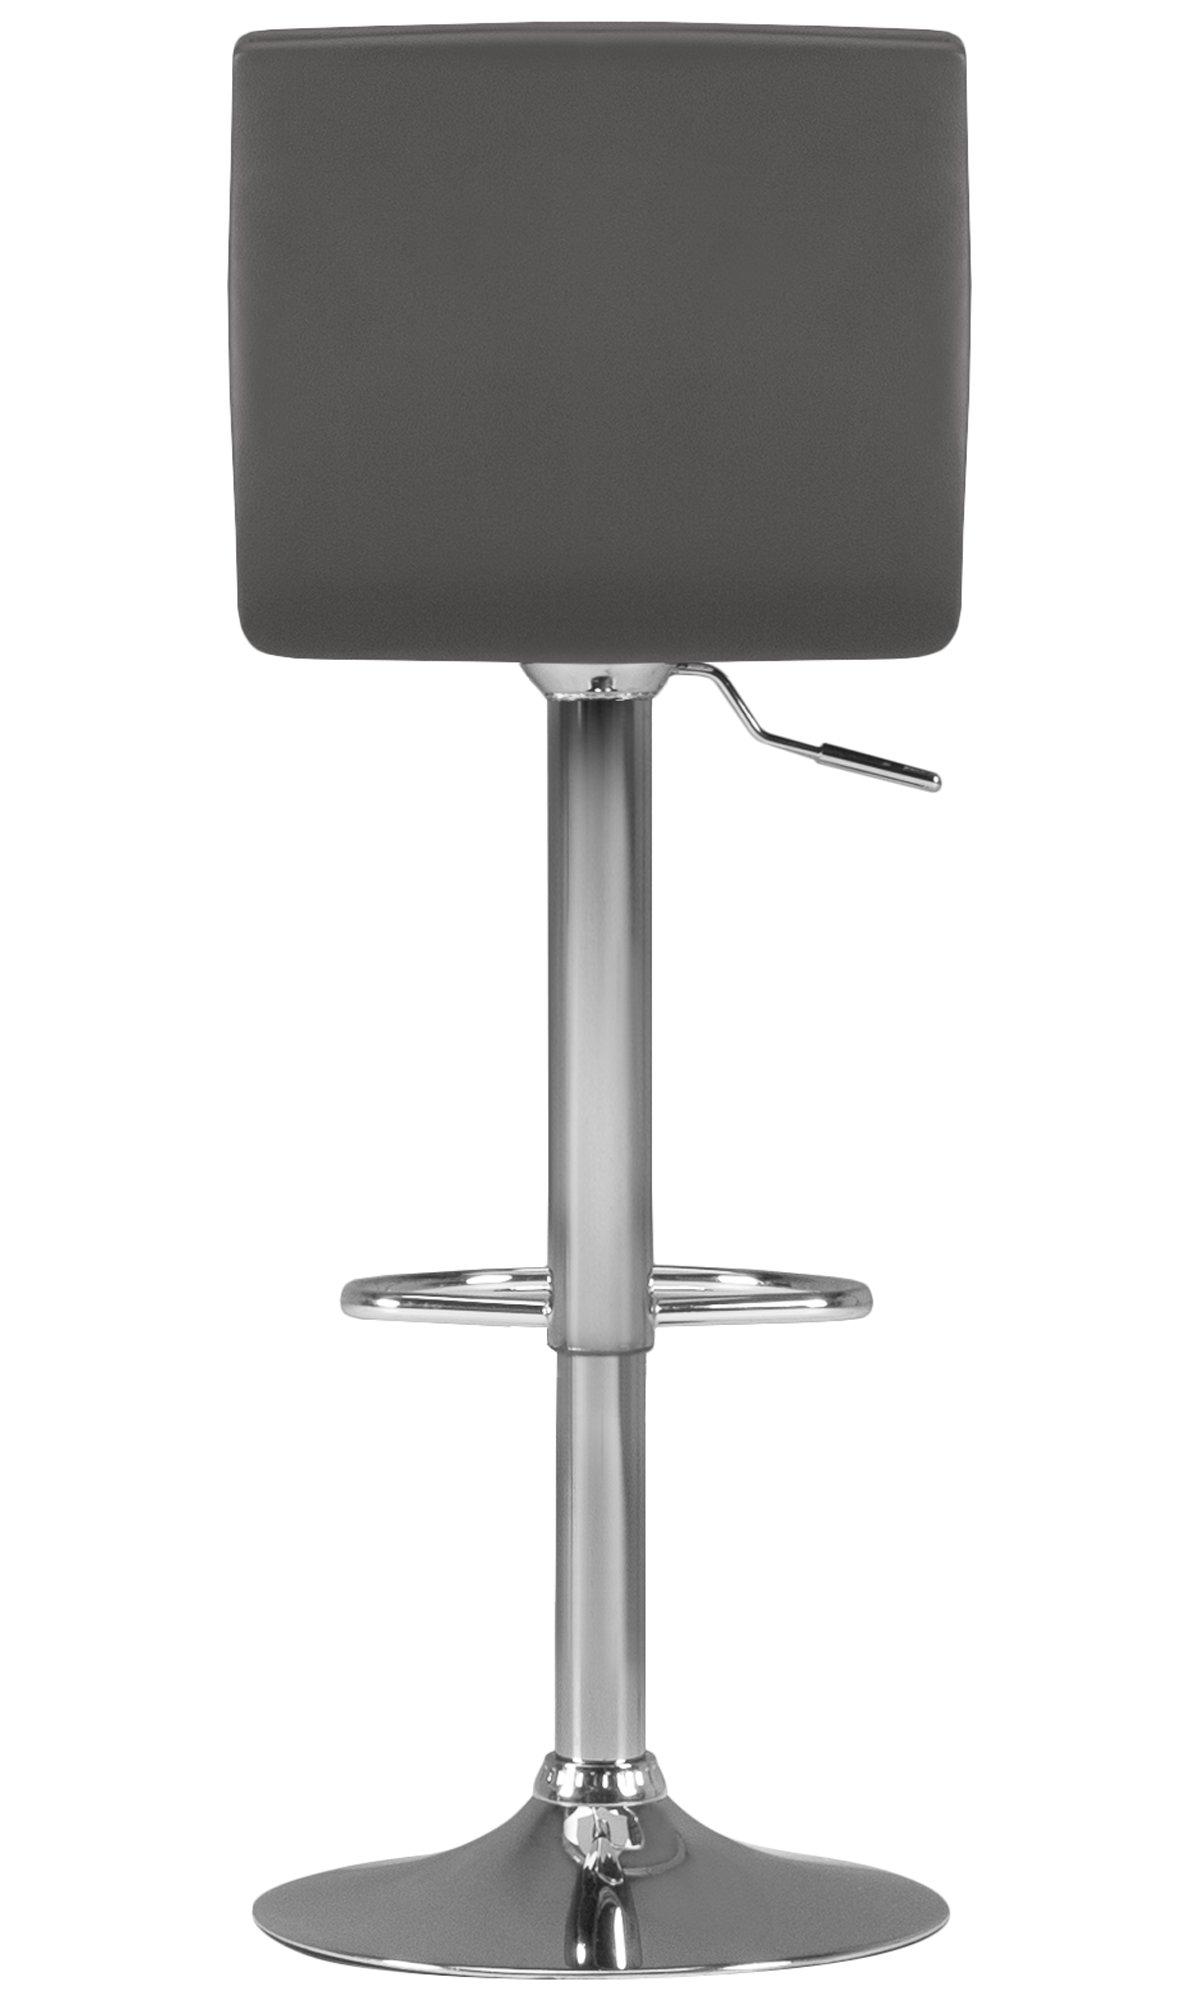 Motivo Gray Upholstered Adjustable Stool